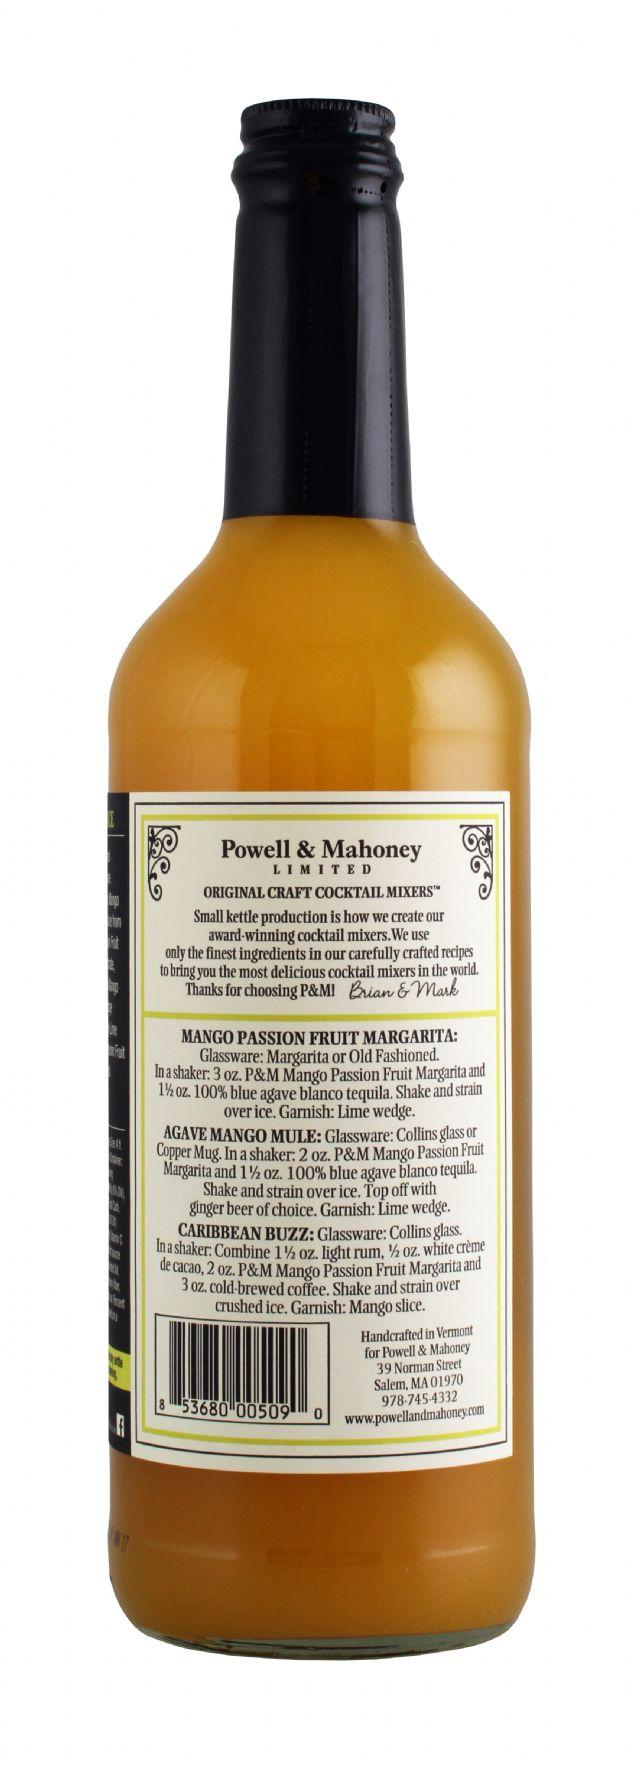 Powell & Mahoney: PM MangoPass Side